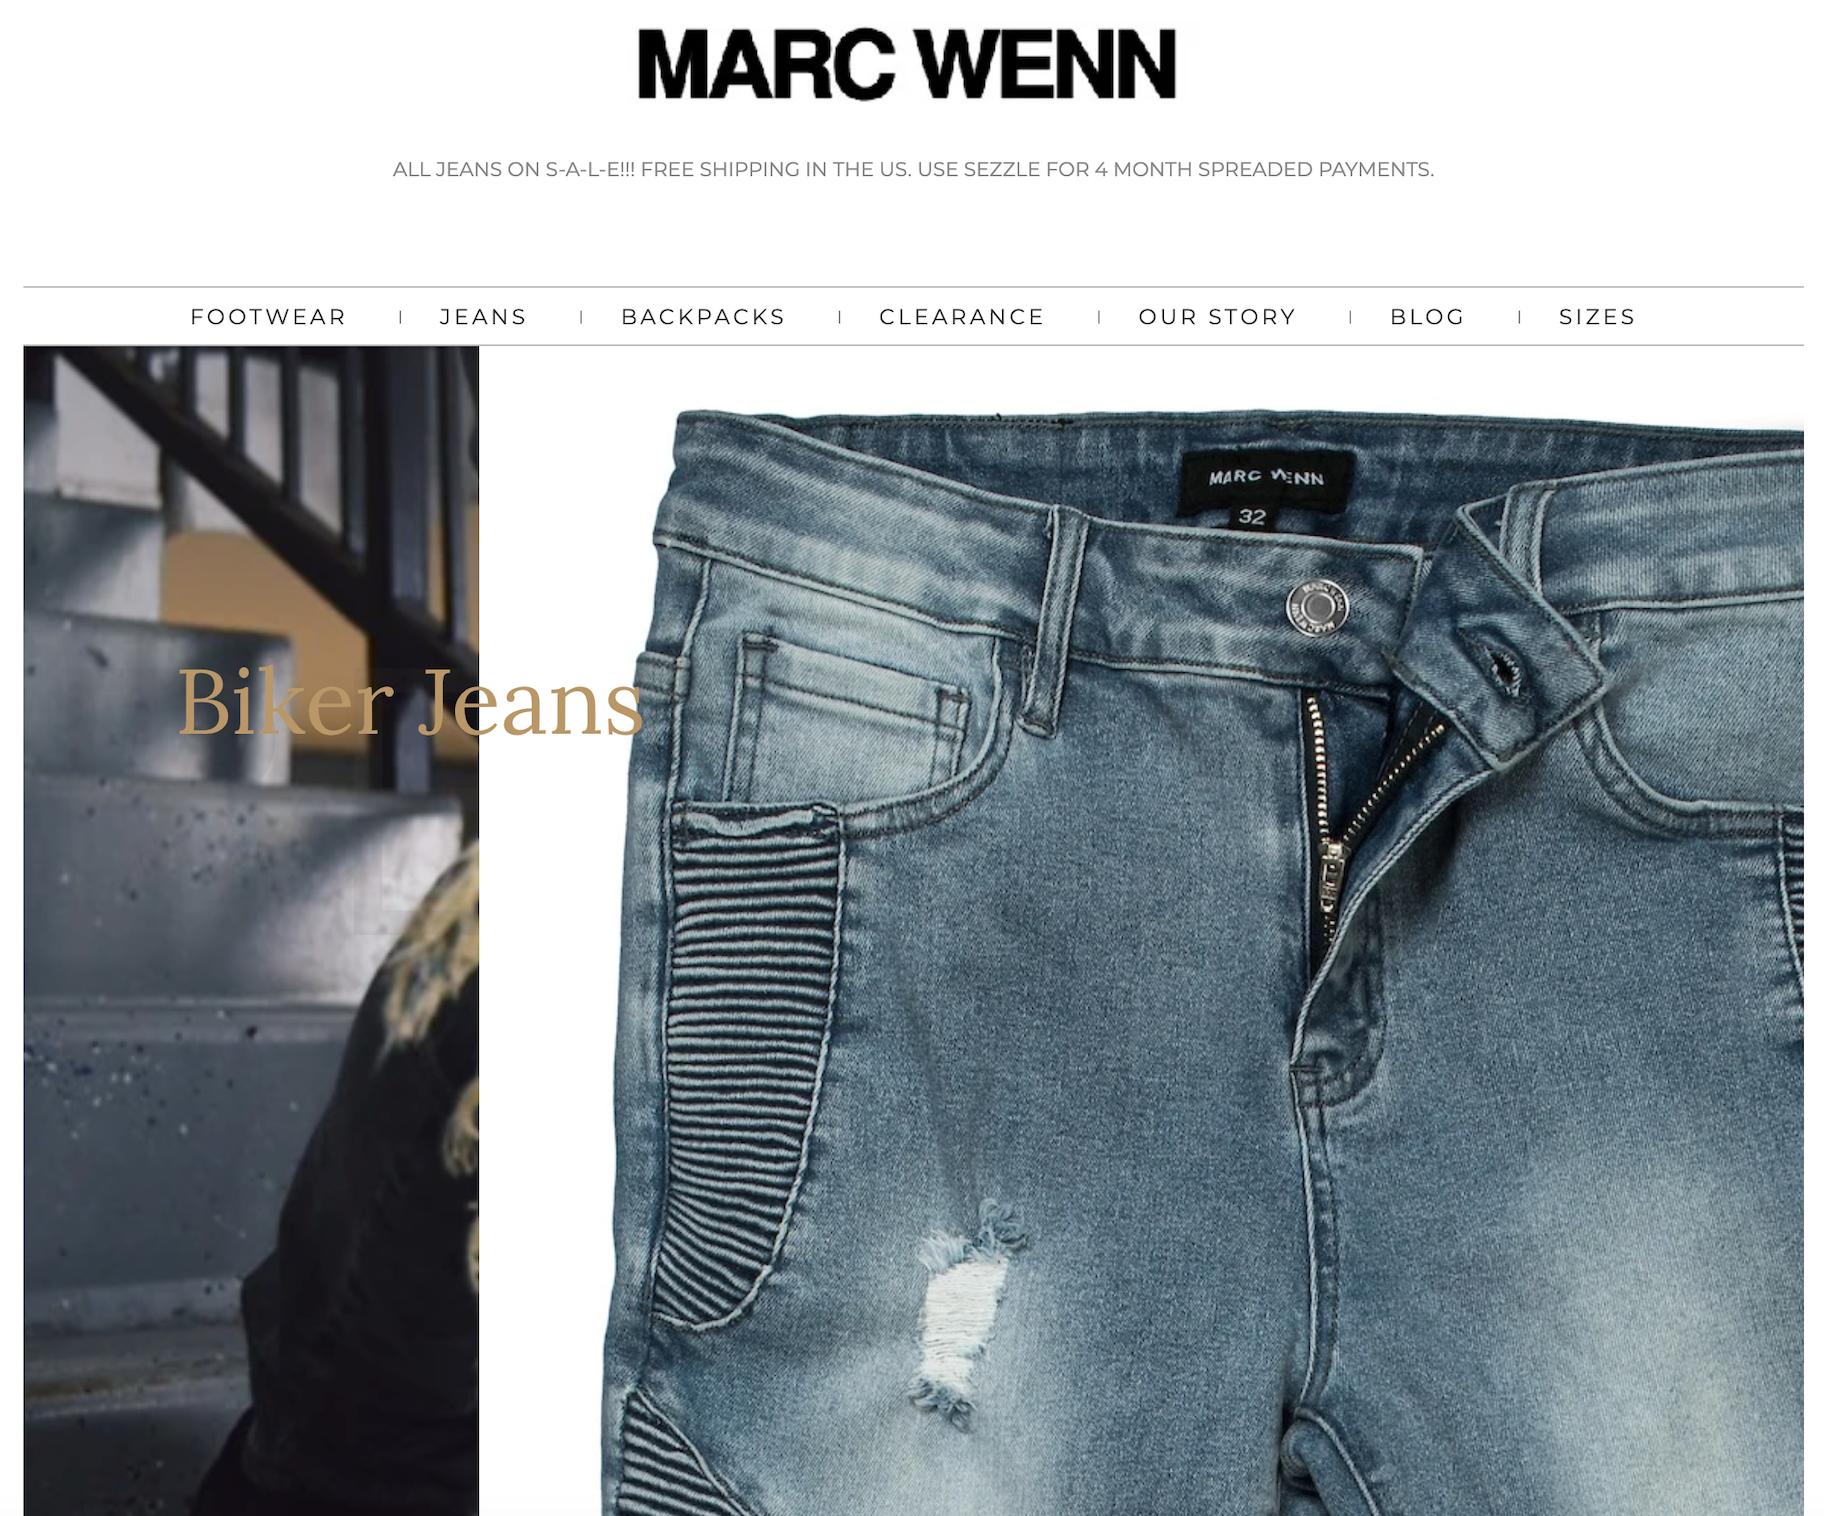 mark wenn biker jeans